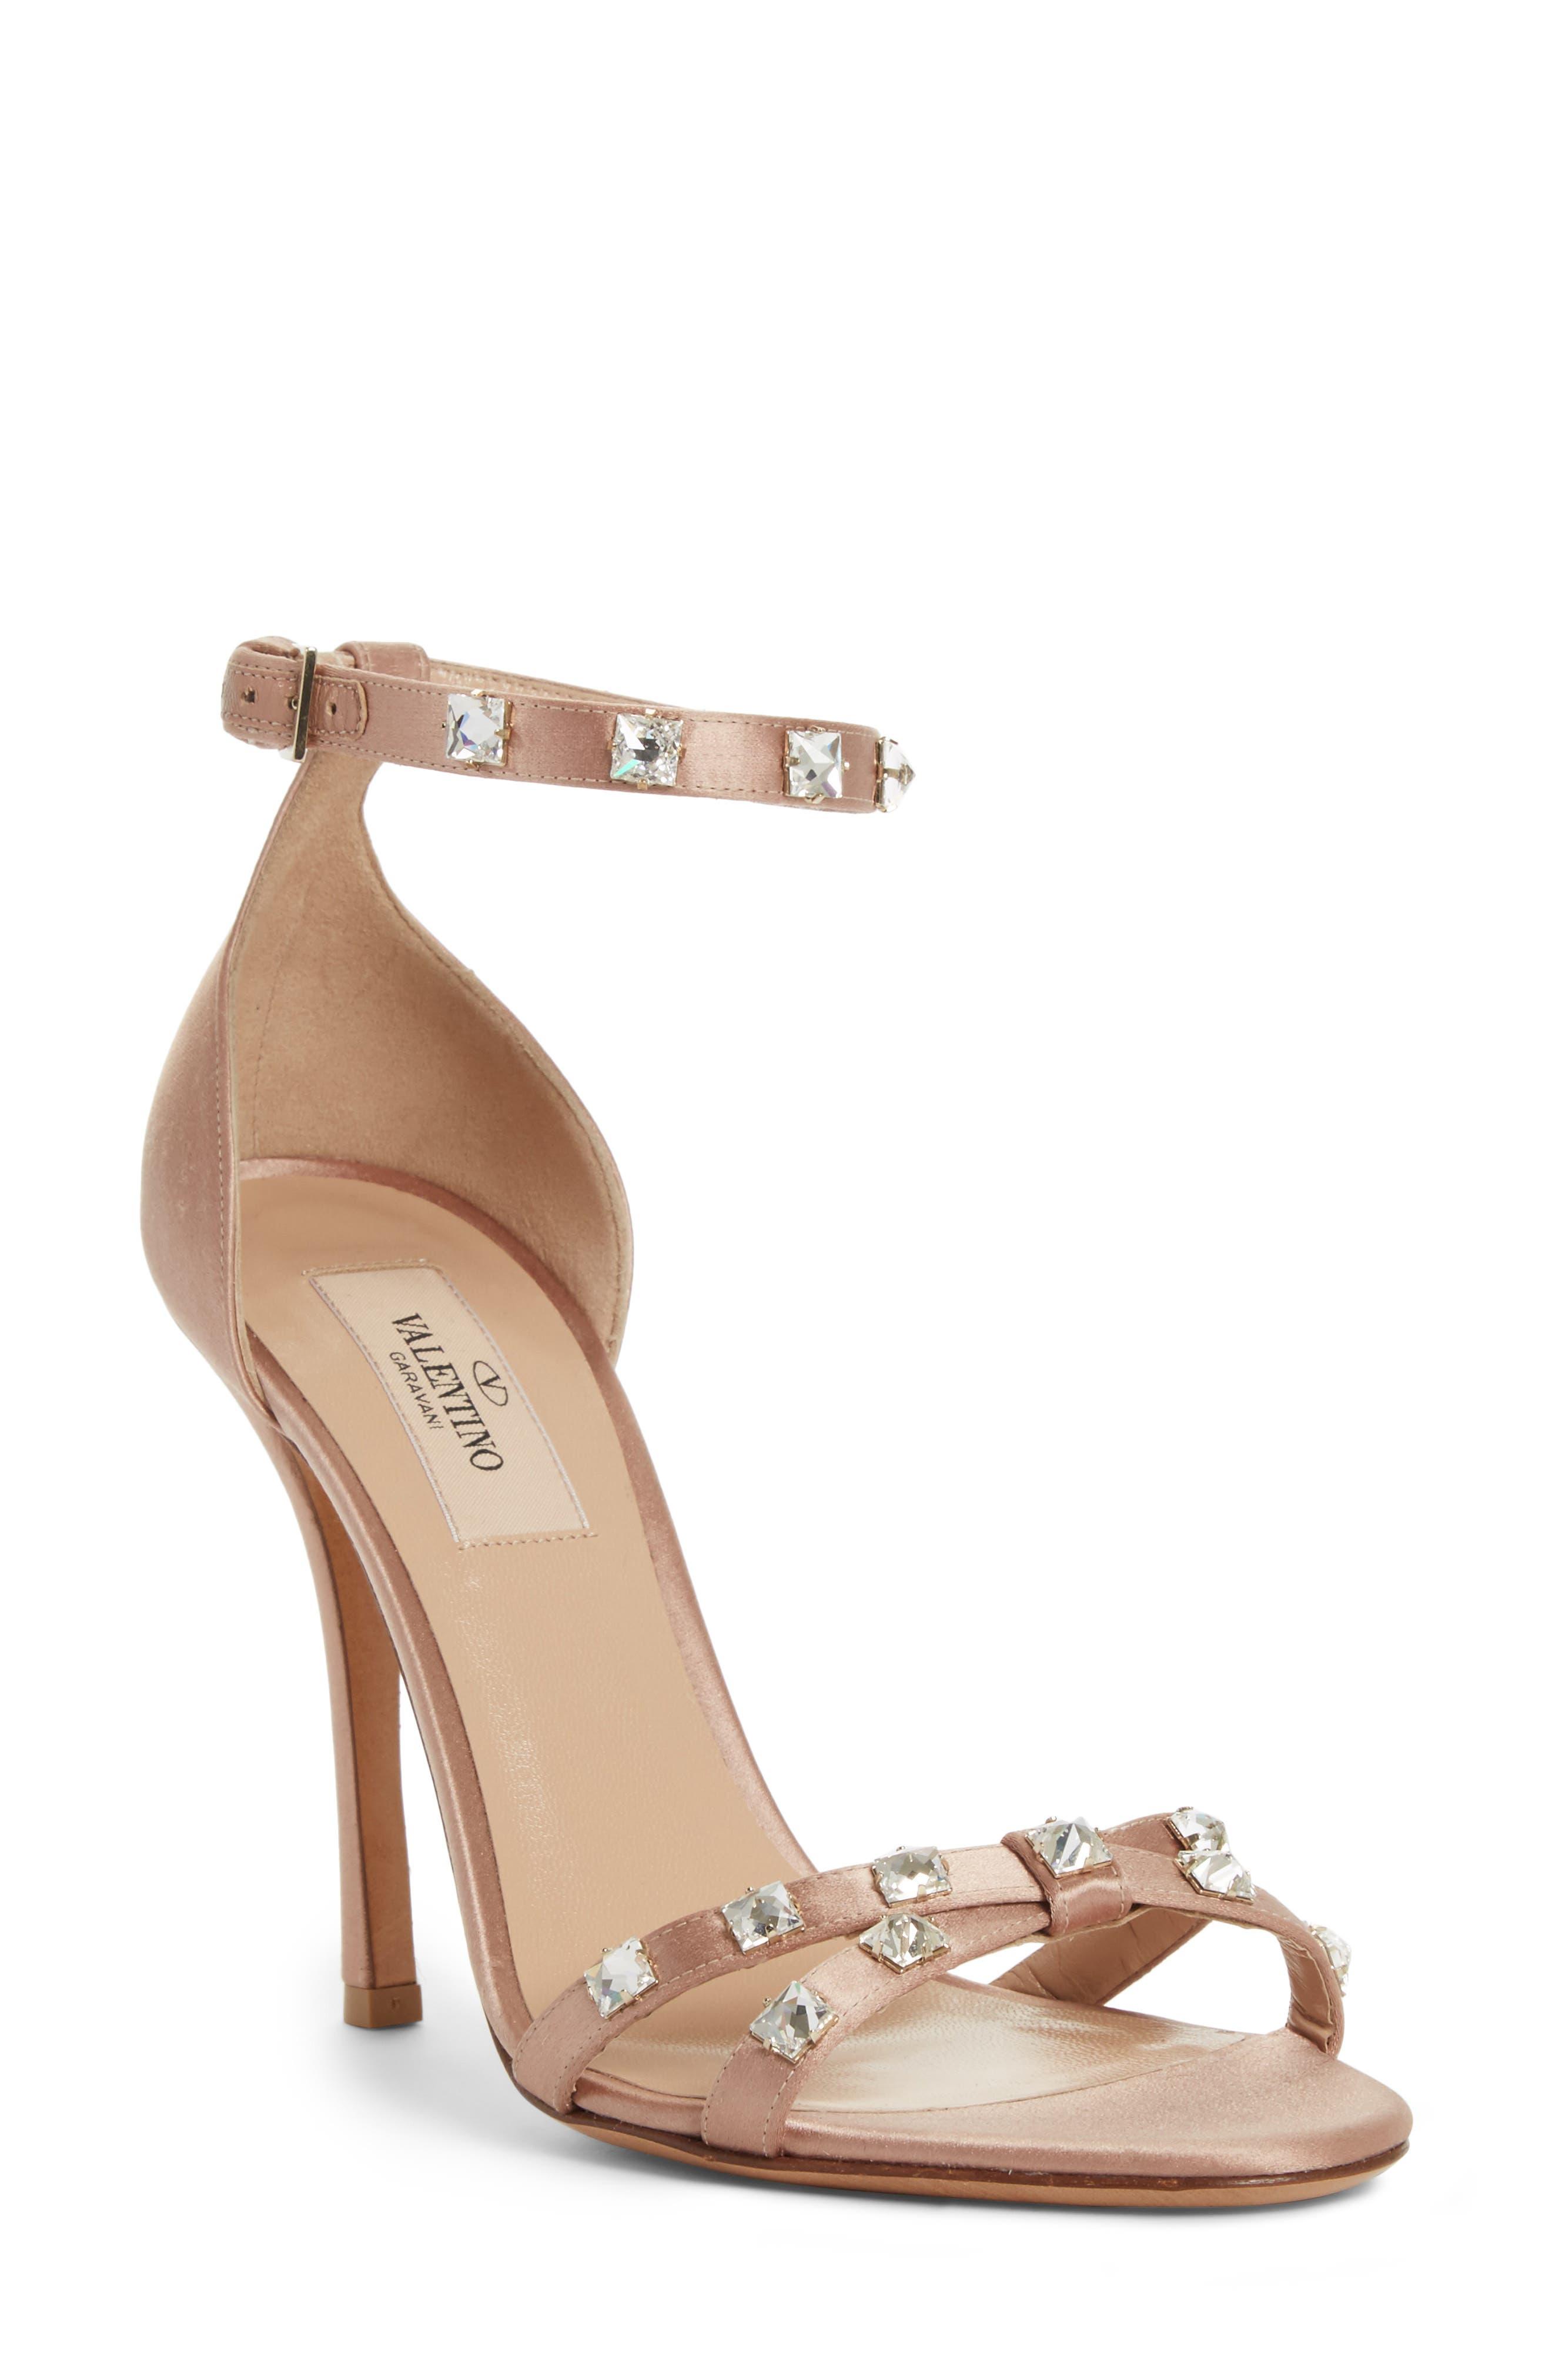 Rockstud Glam Ankle Strap Sandal,                             Main thumbnail 1, color,                             250